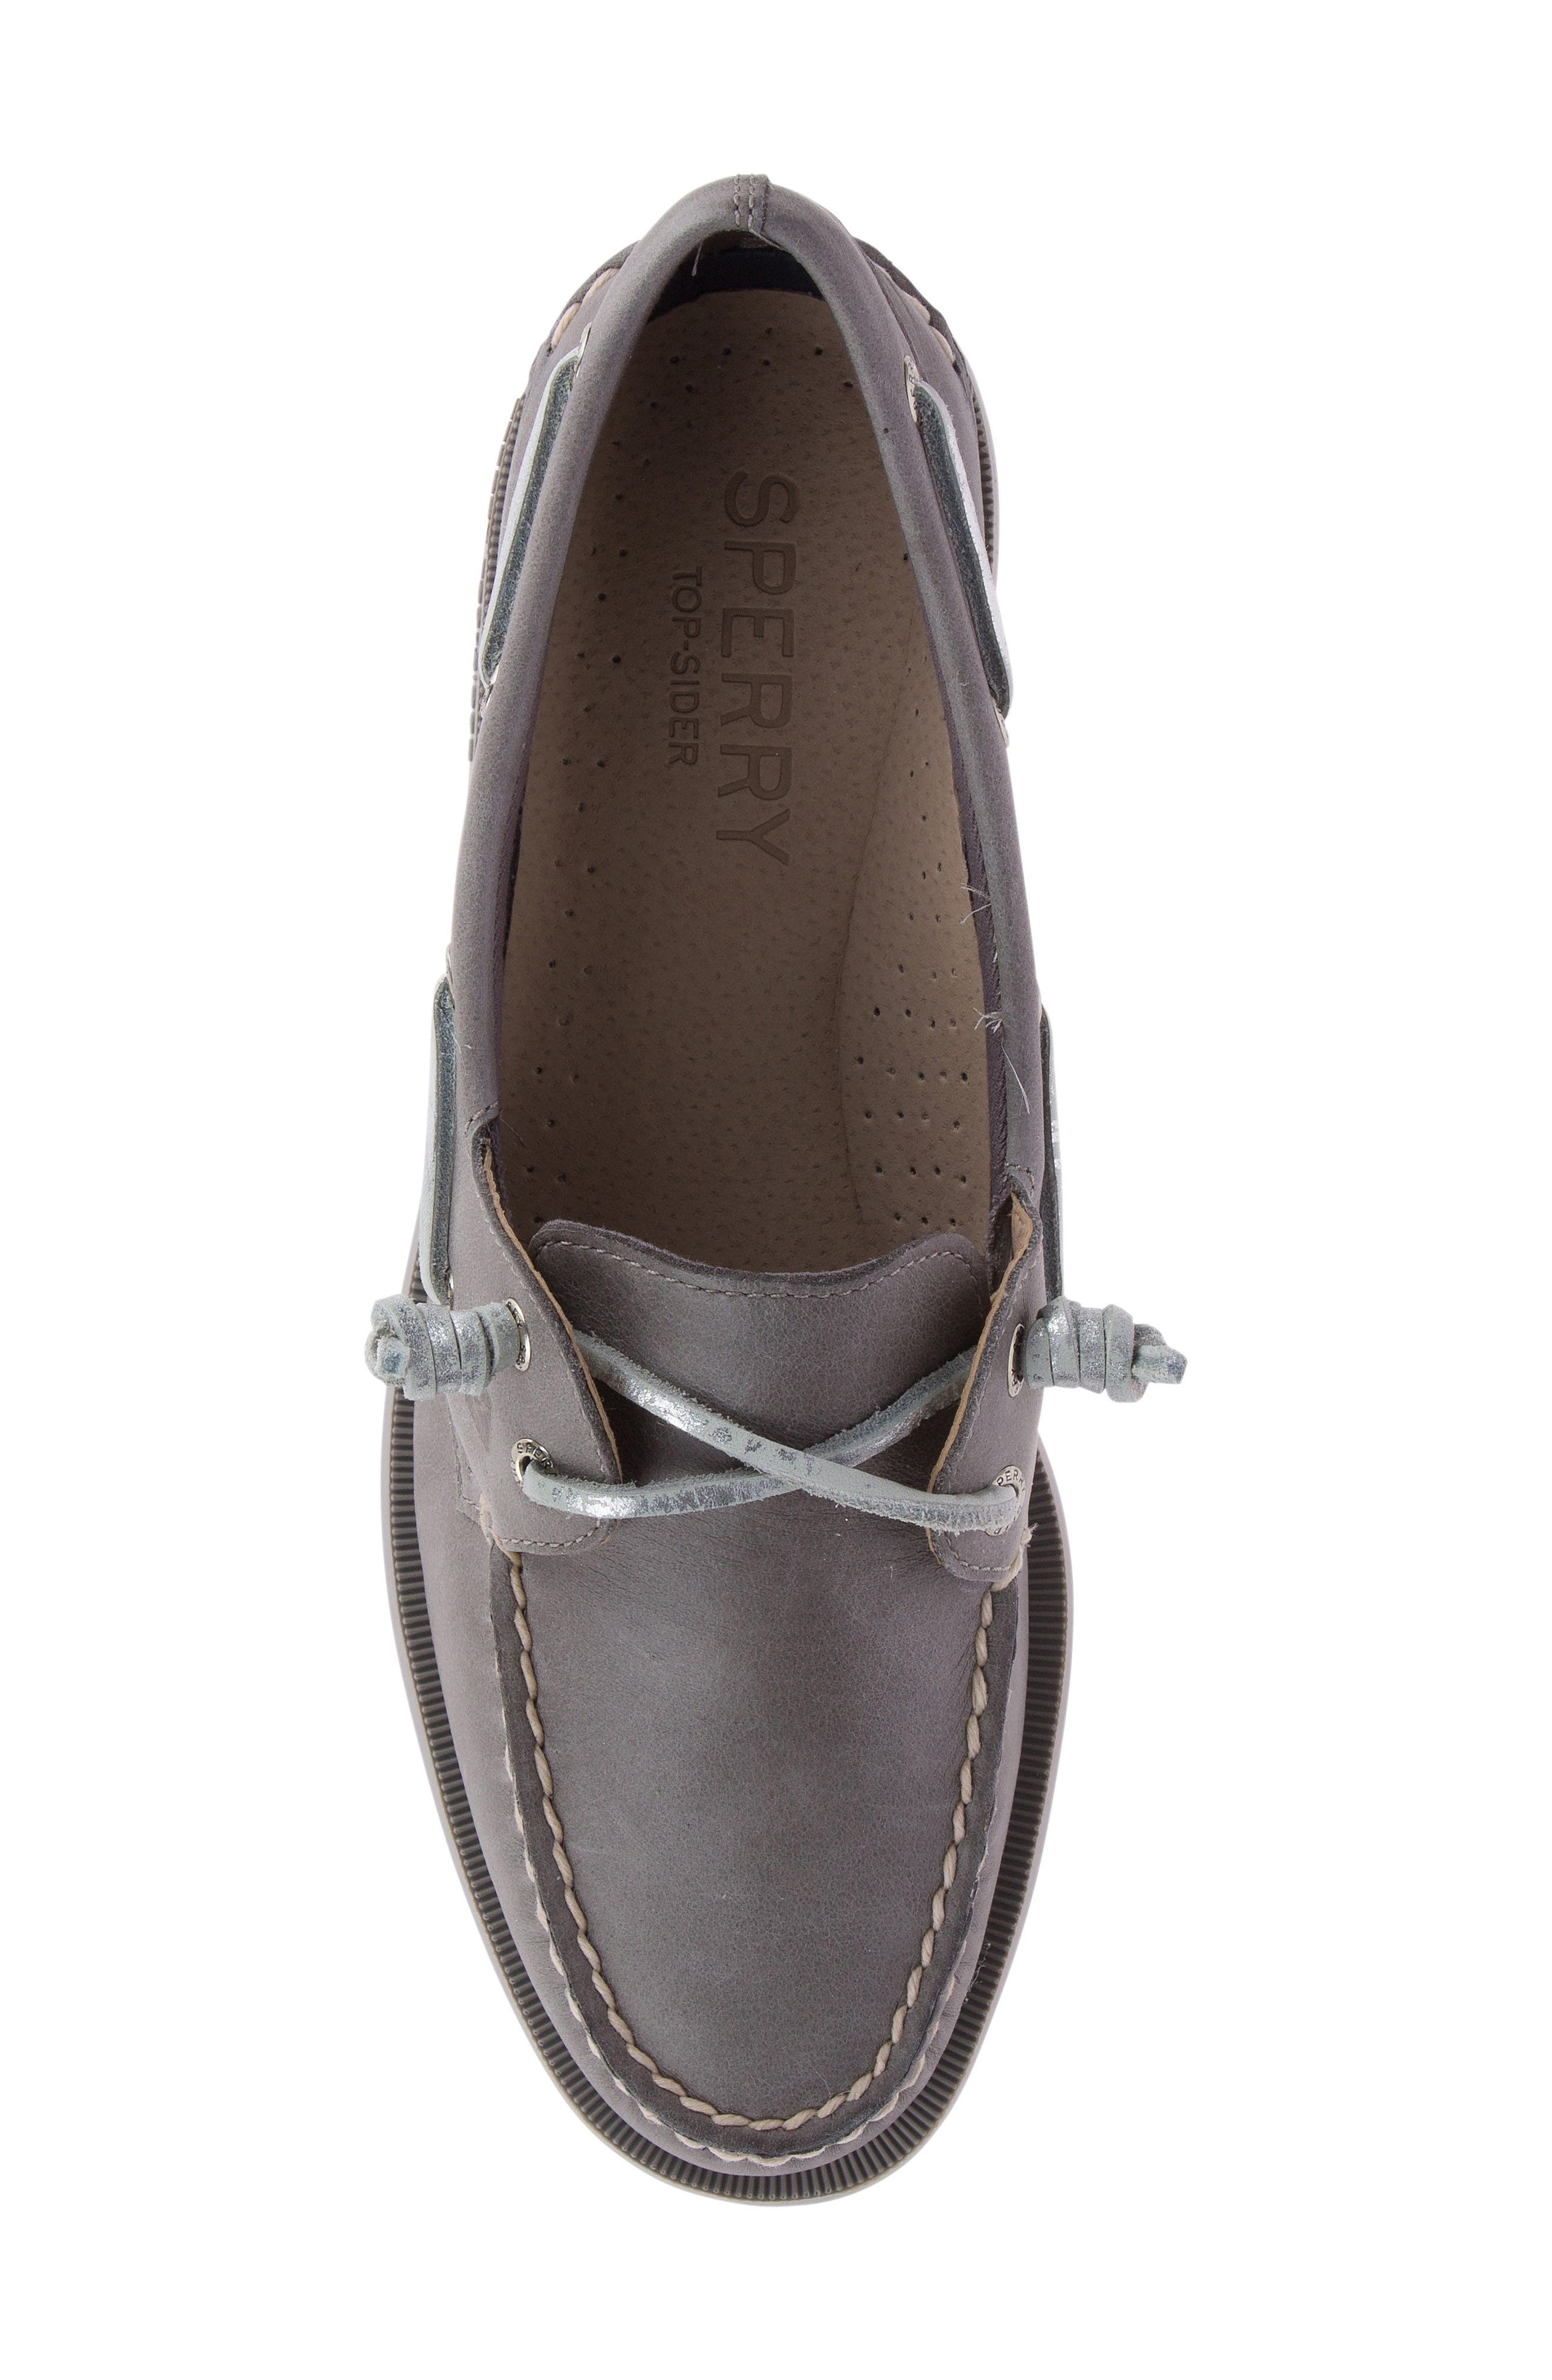 Vida Boat Shoe,                             Alternate thumbnail 4, color,                             Driftwood Leather